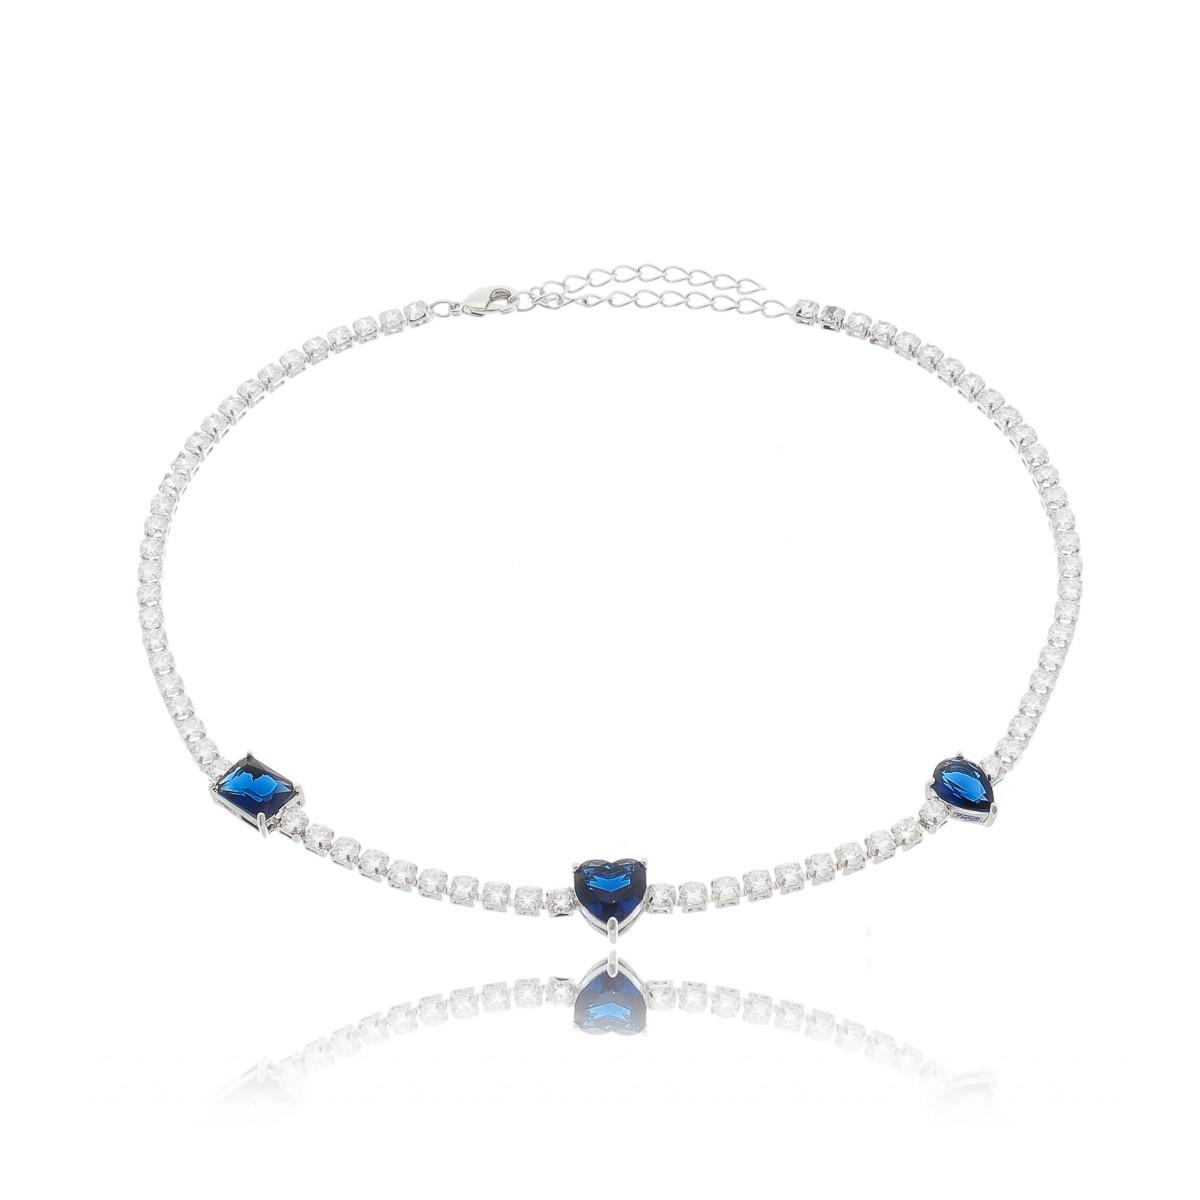 081f31d1949 Choker Riviera Pingentes Azul Safira Semijoia em Ródio Branco - Soloyou ...